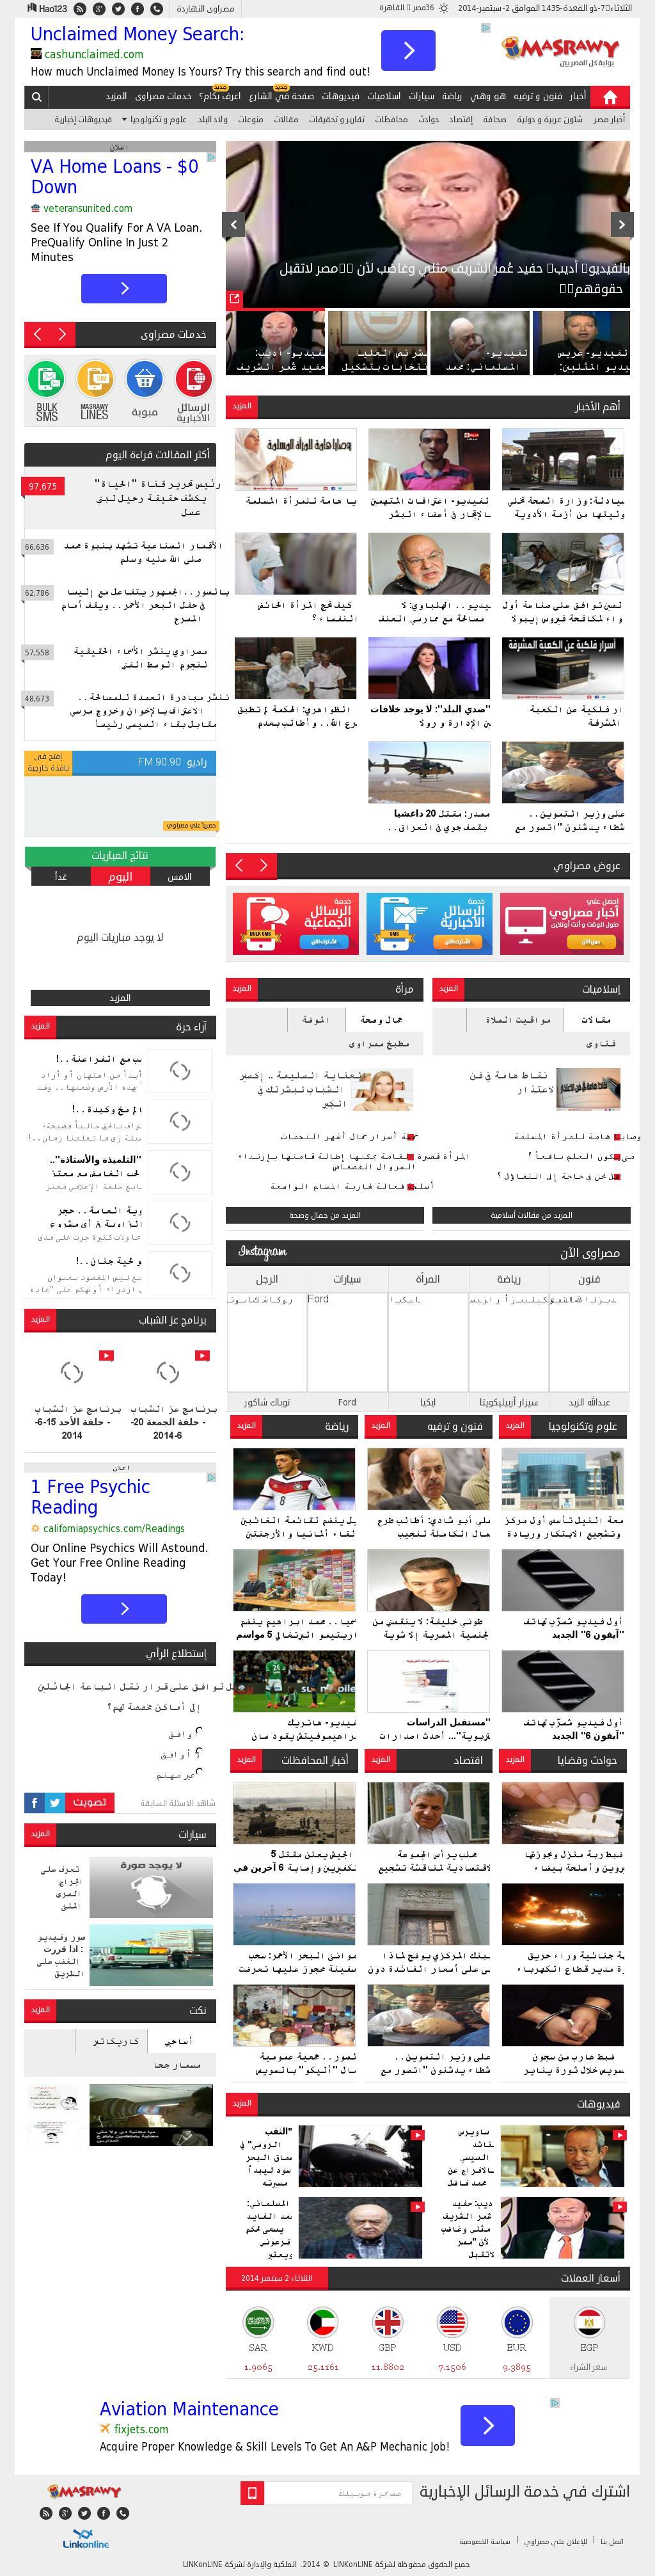 Masrawy at Tuesday Sept. 2, 2014, 12:12 a.m. UTC